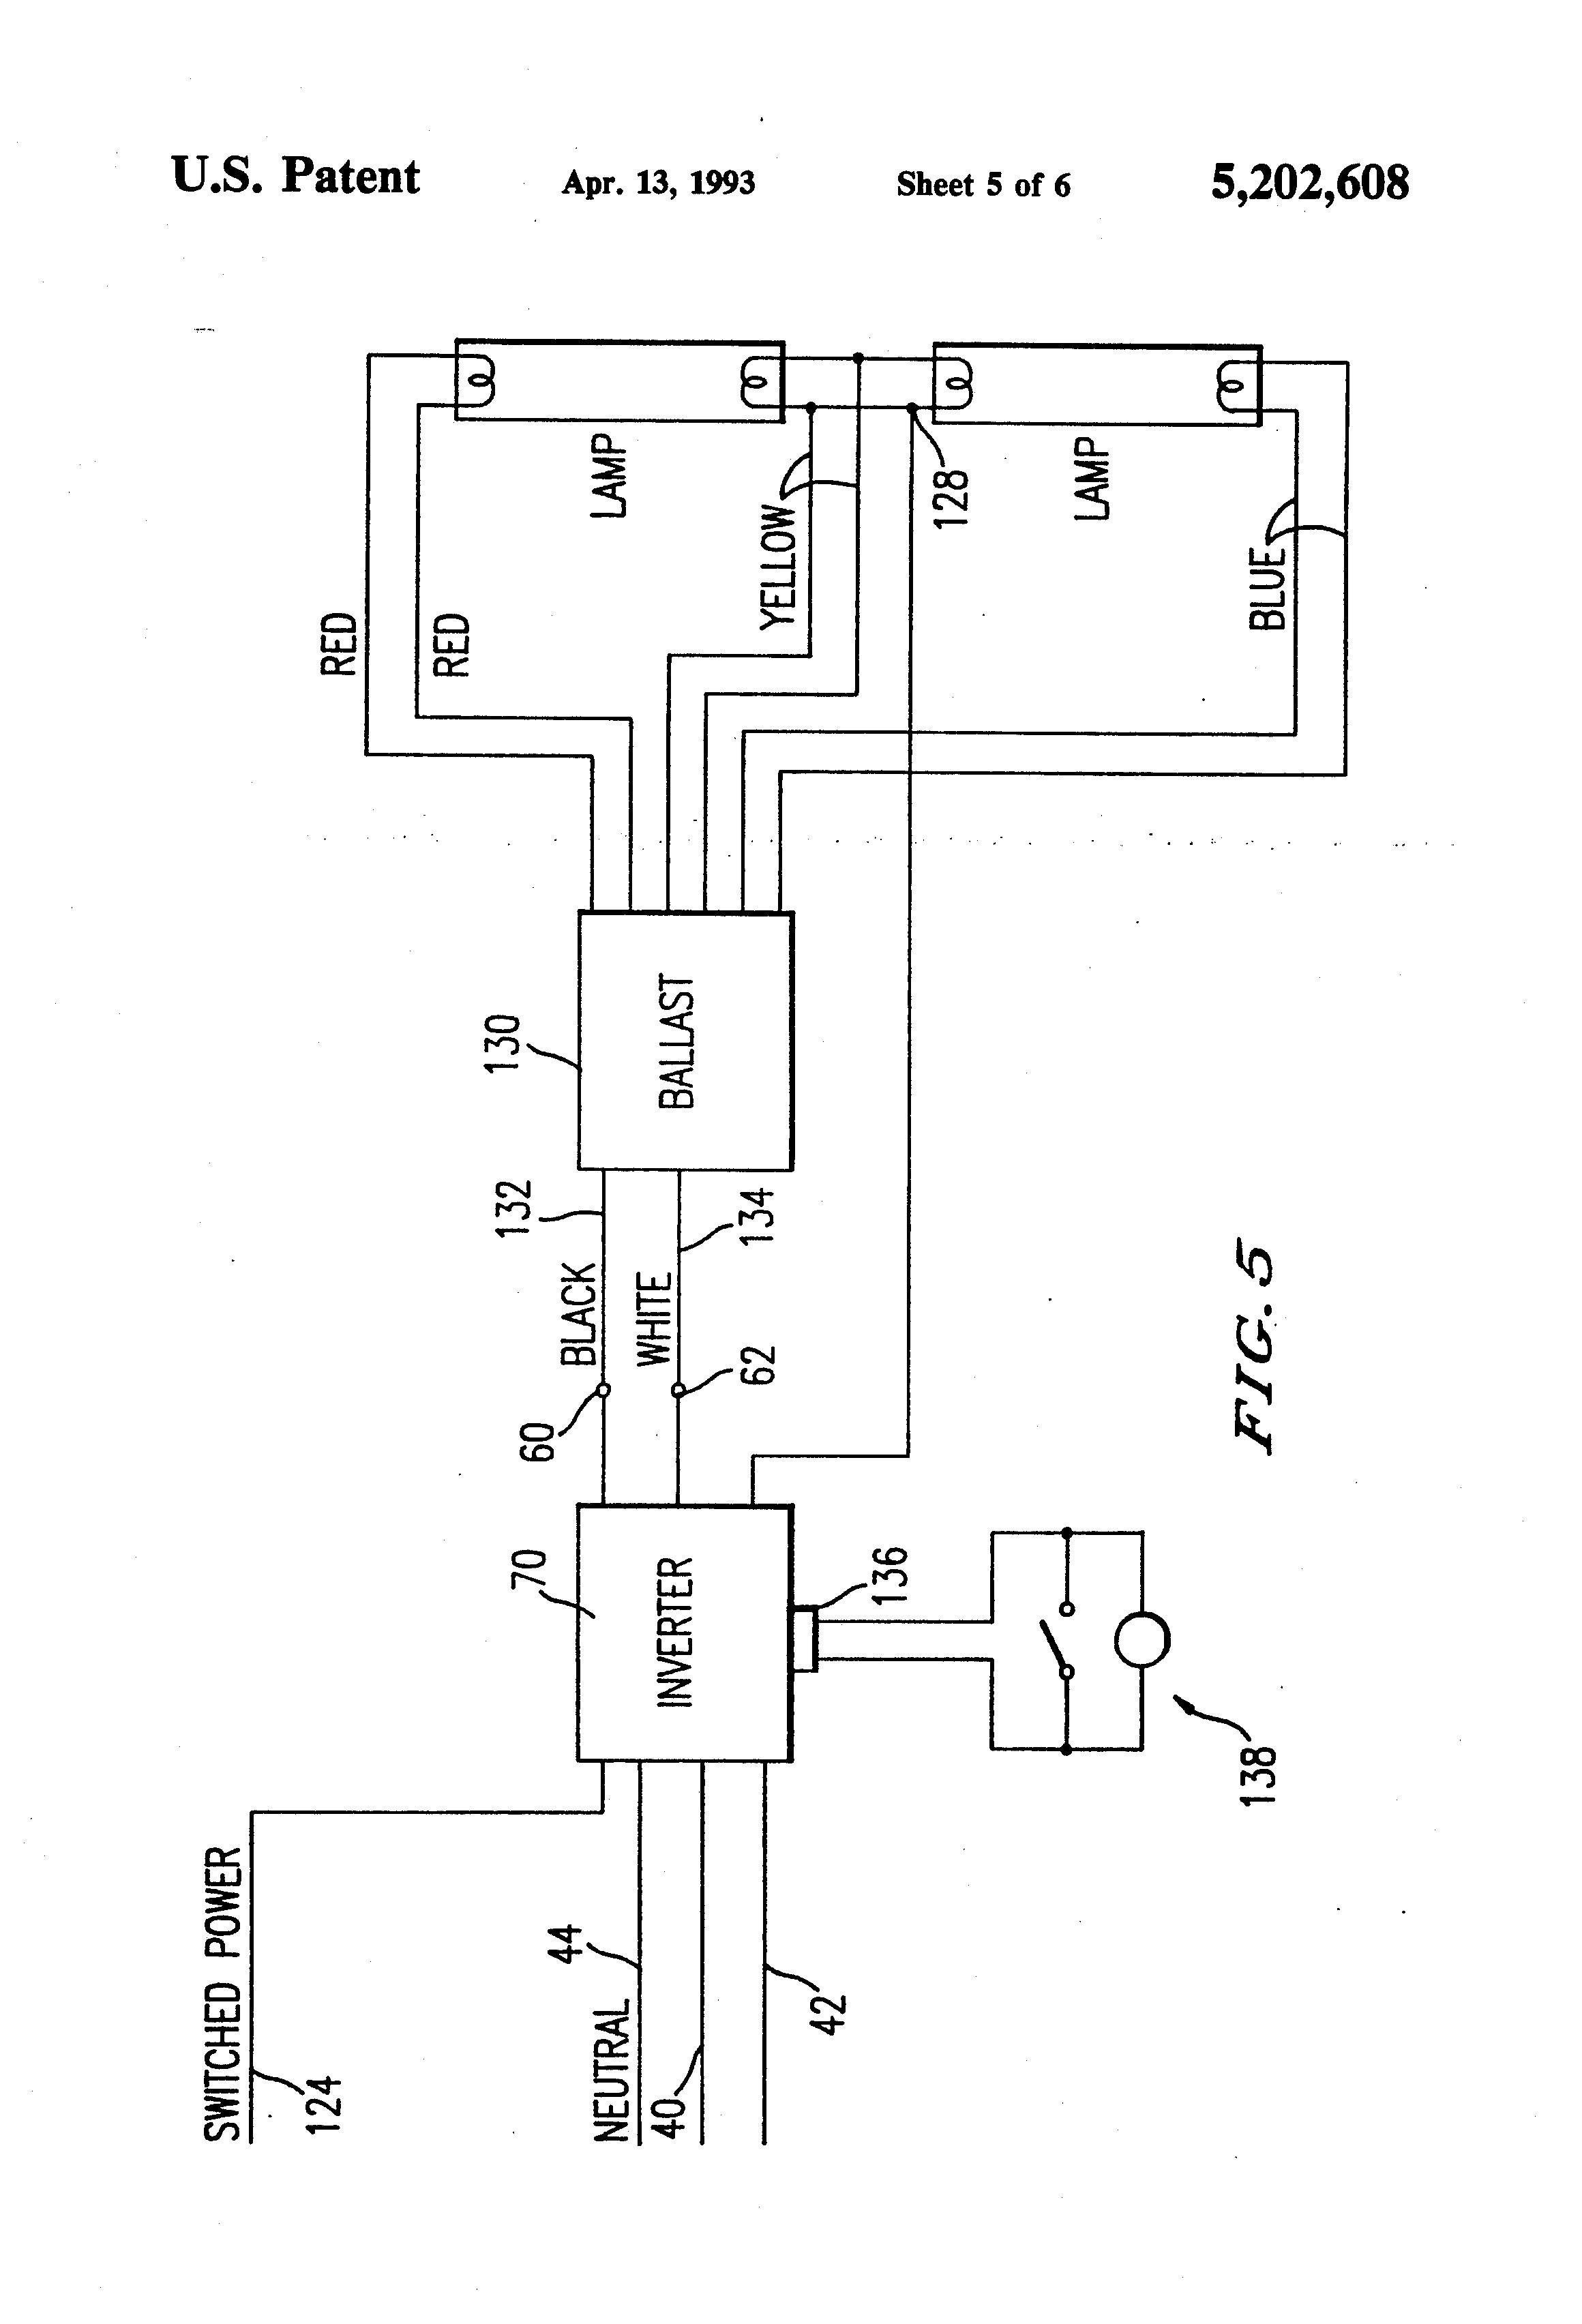 Lithonia Led Light Ballast Wiring Diagram 1961 Corvette Wiring Schematic For Wiring Diagram Schematics